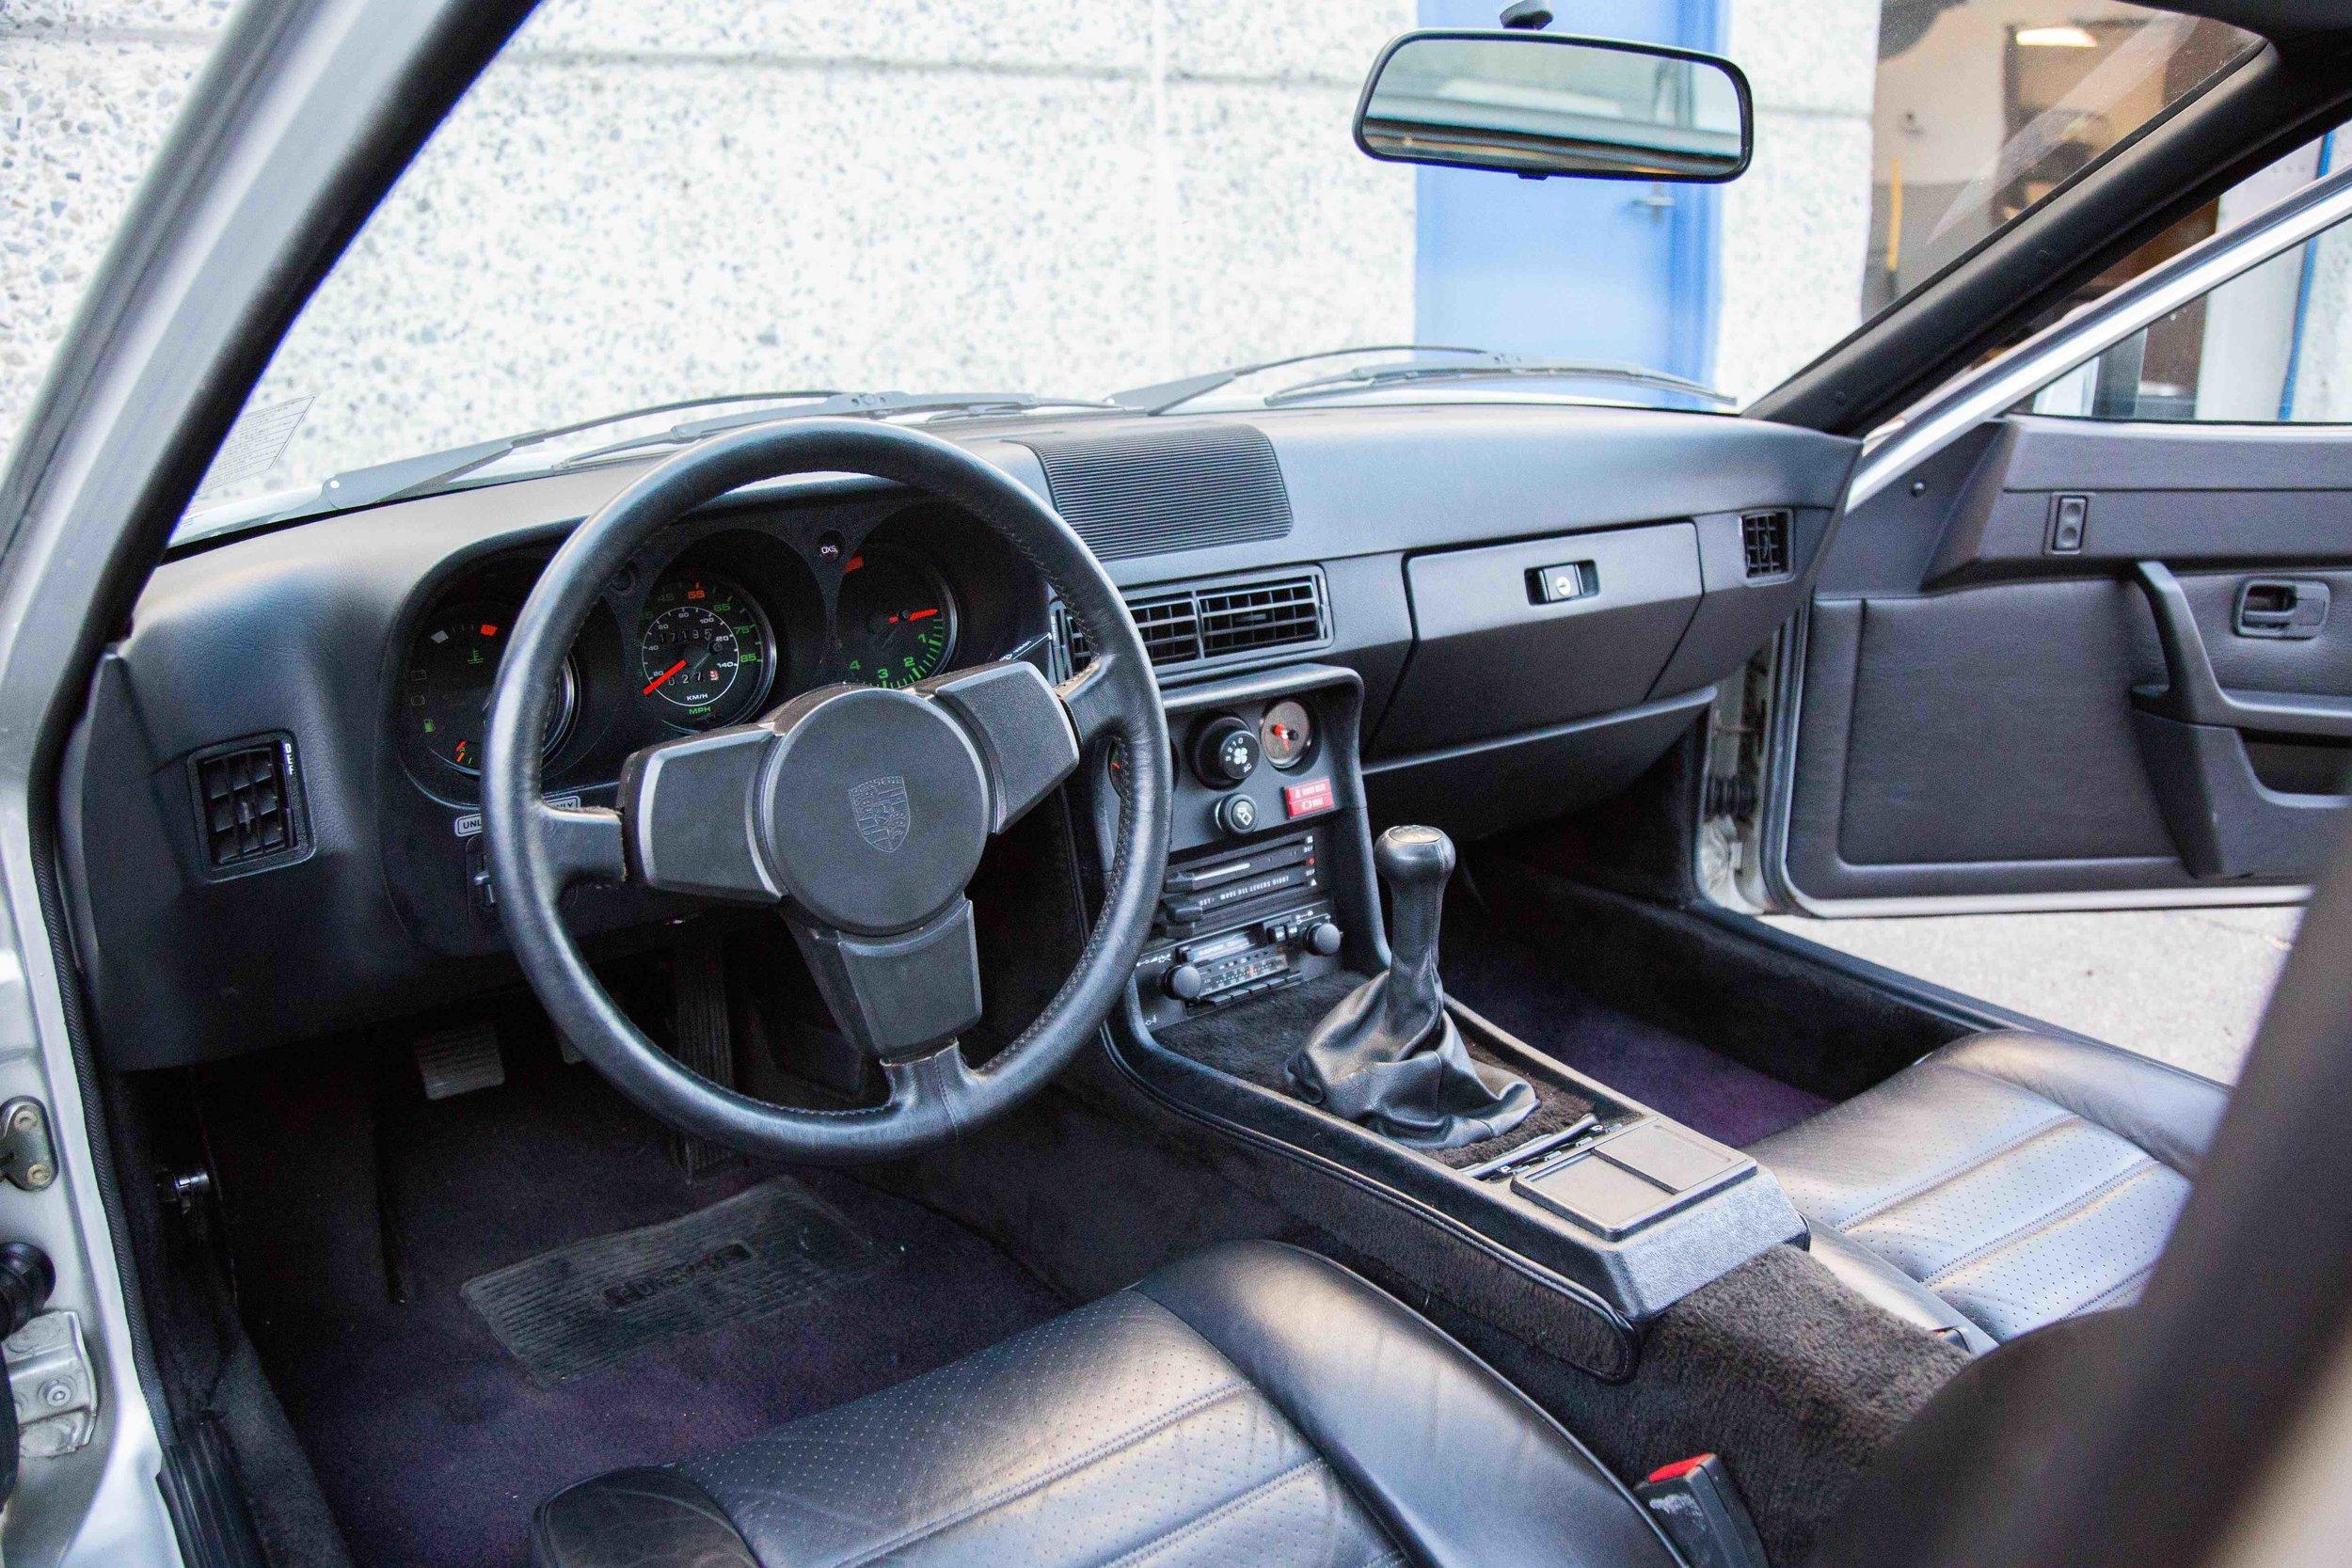 1980-924-Turbo-interior-view-makellos-classics.jpeg